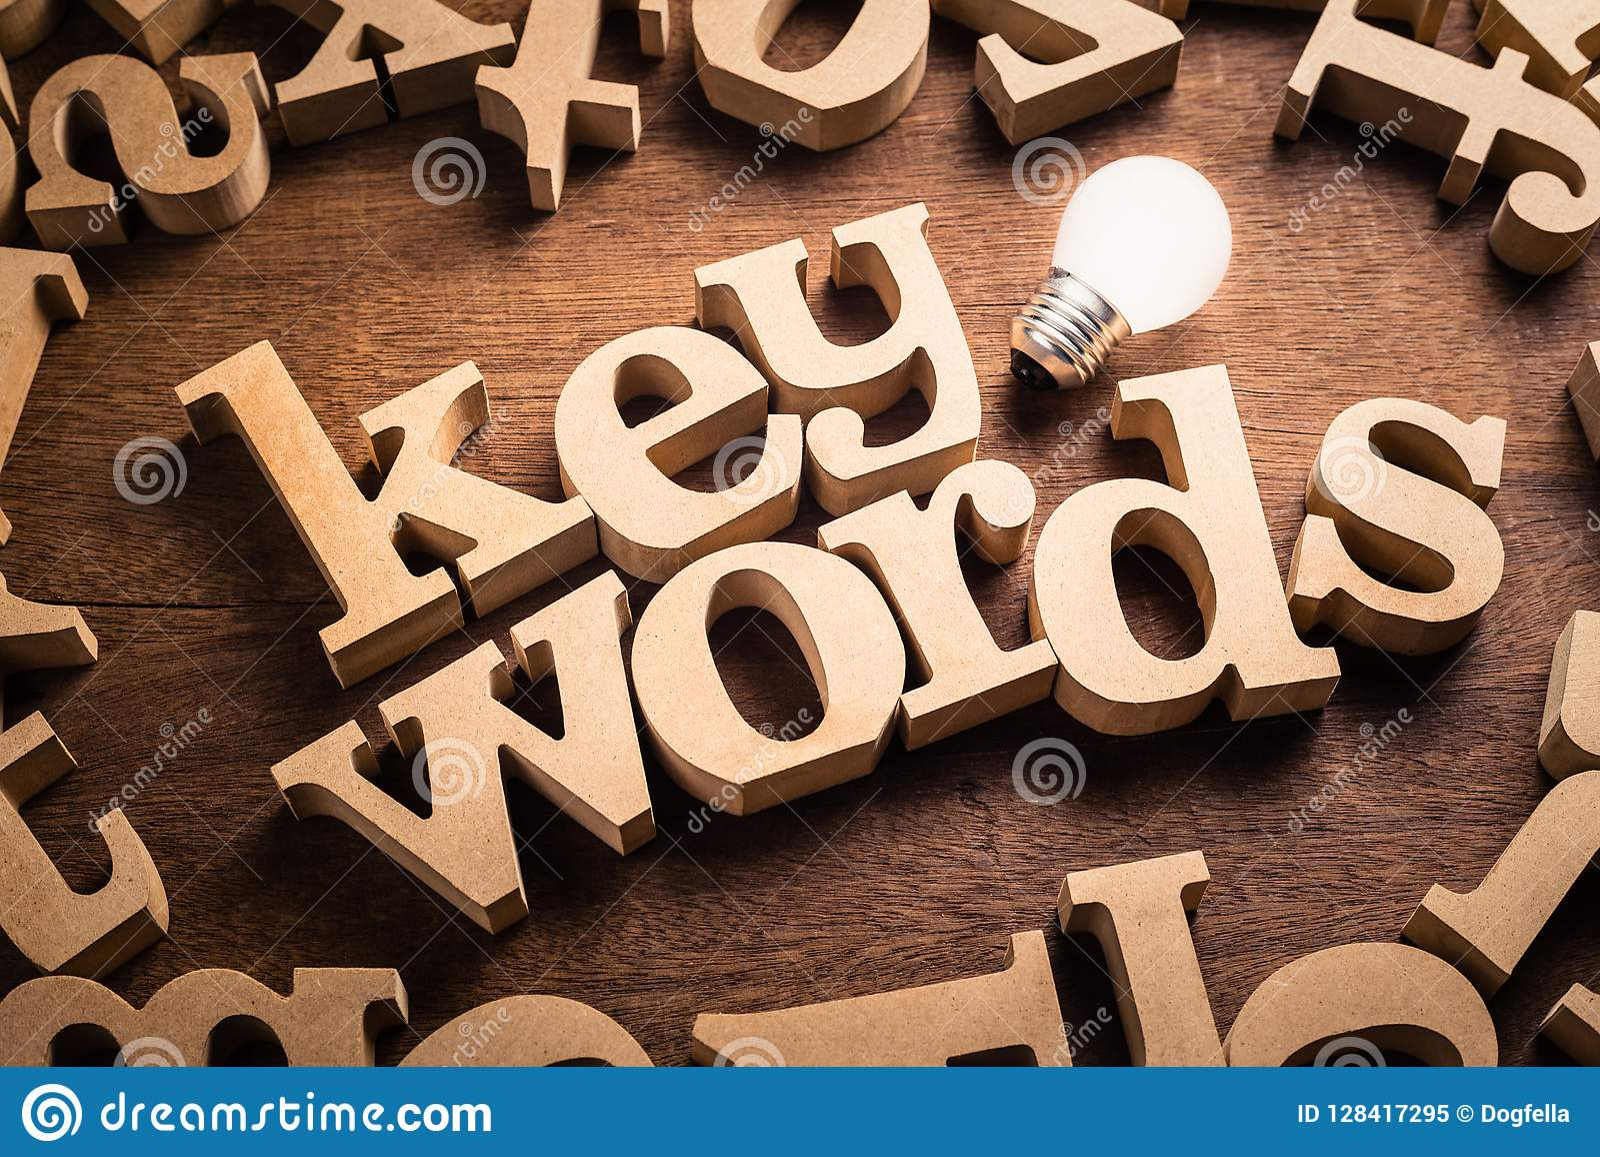 Keyword Idea Topic